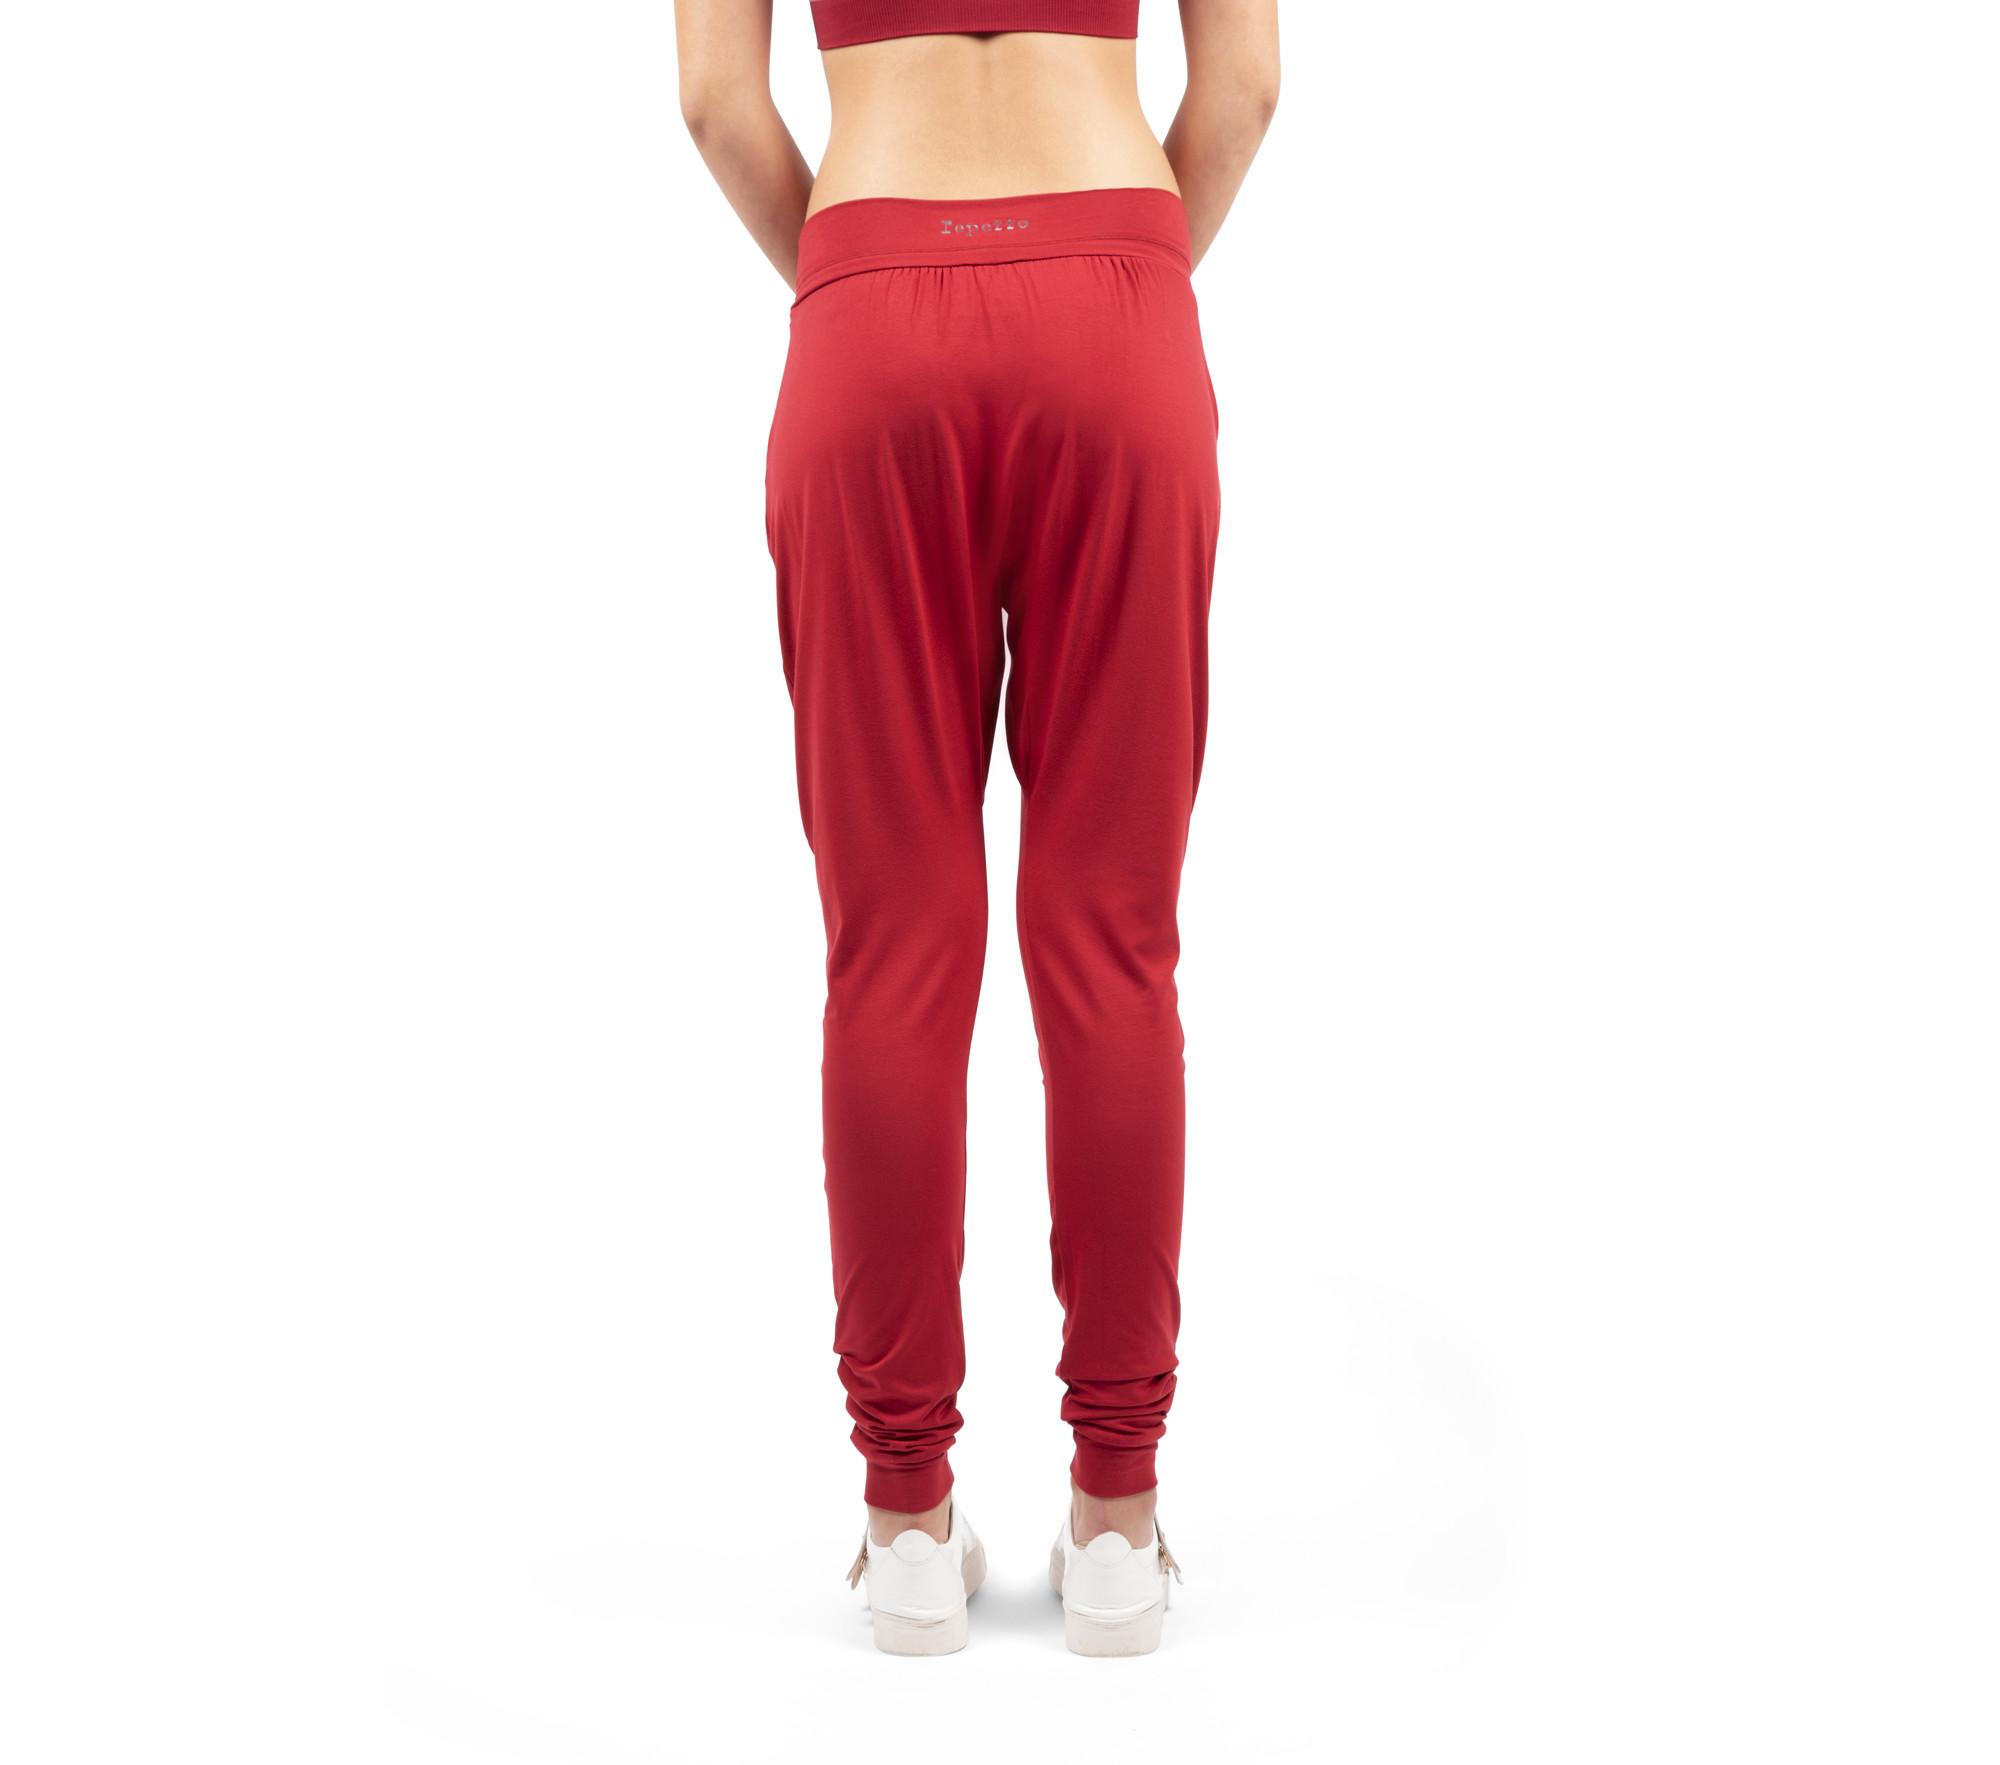 Pantalone forma sarwil in viscosa